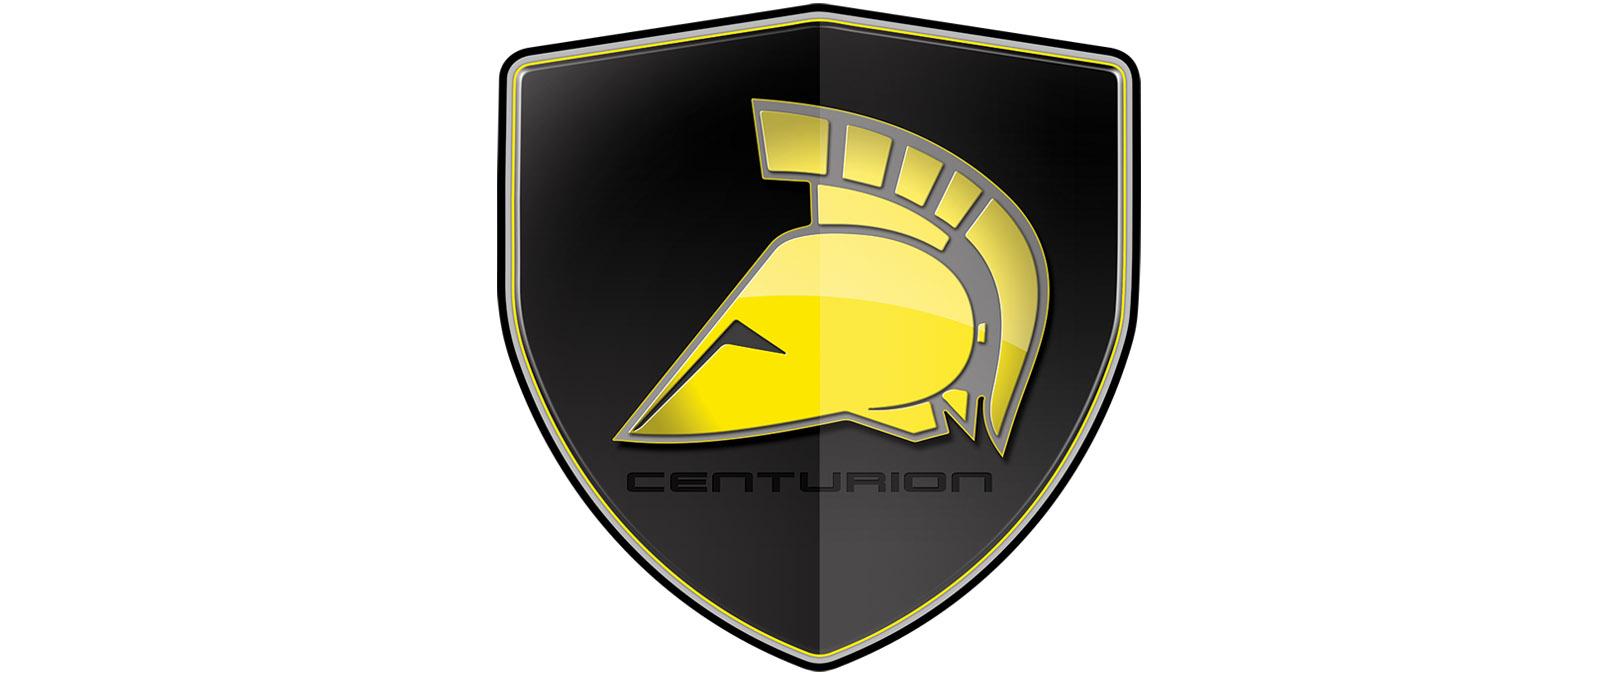 Centurion-Logo2014.jpg